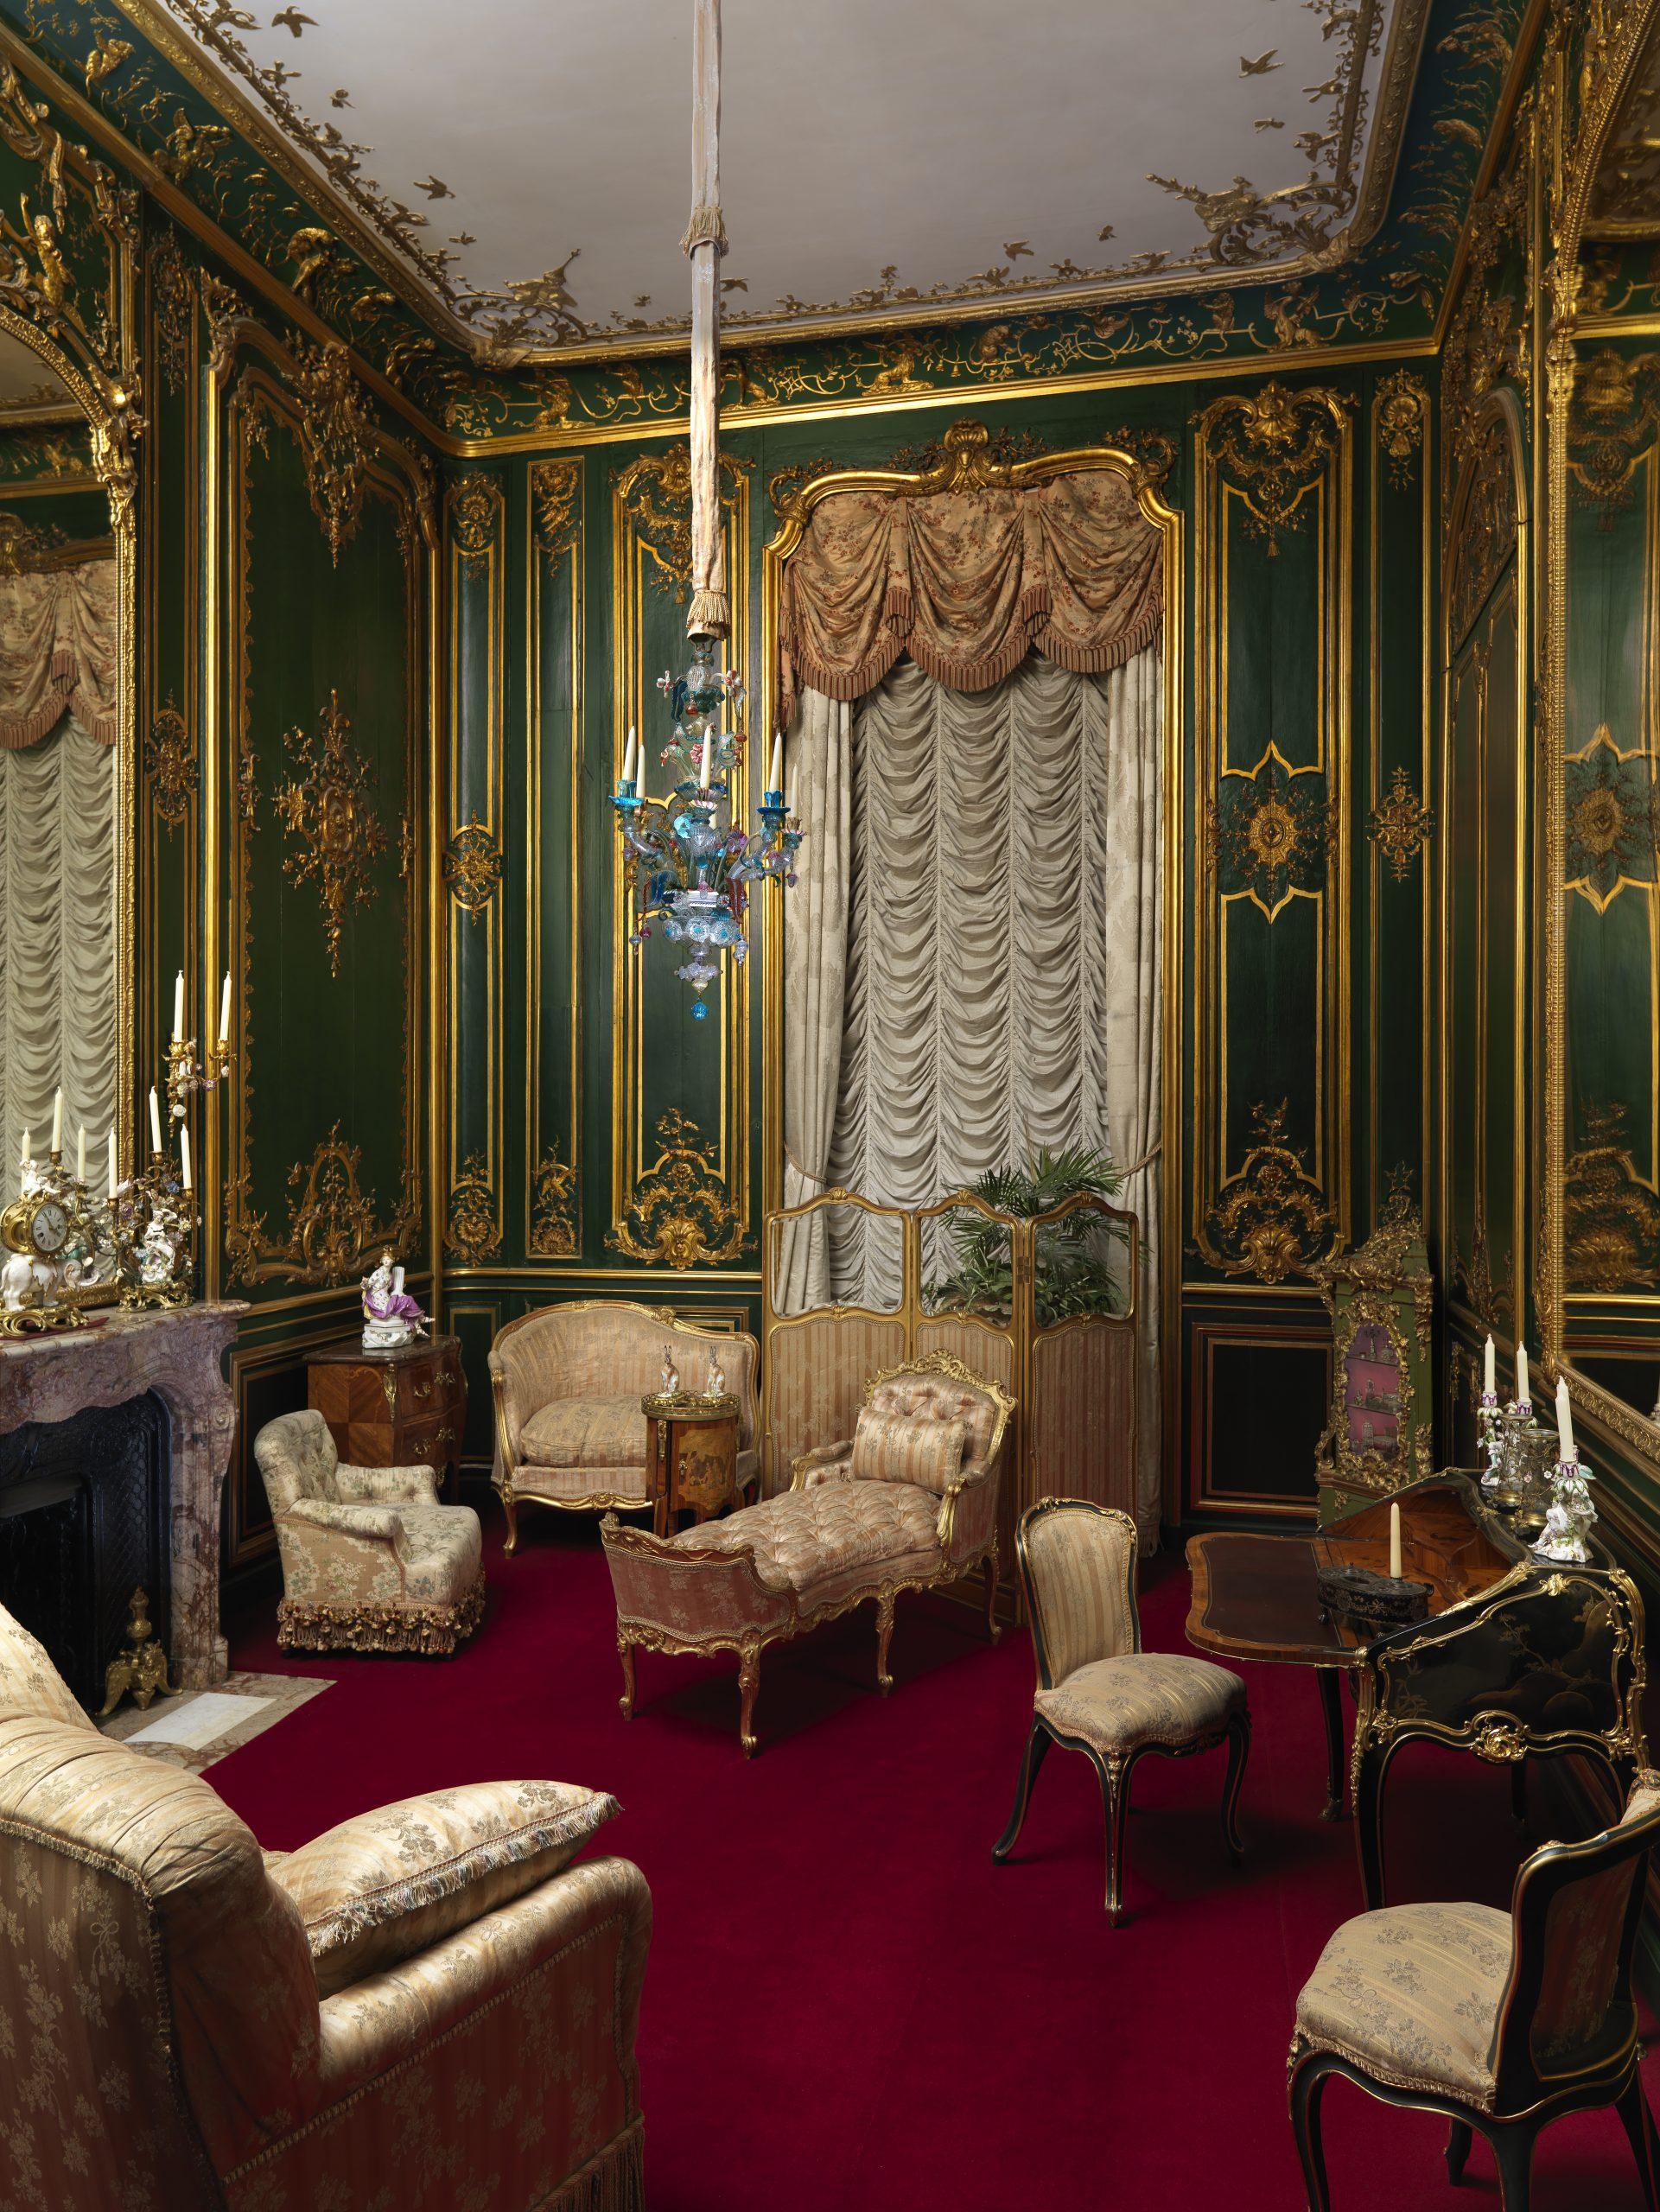 The Green Boudoir Waddesdon Manor - Photo: John Bigelow Taylor  ©The National Trust